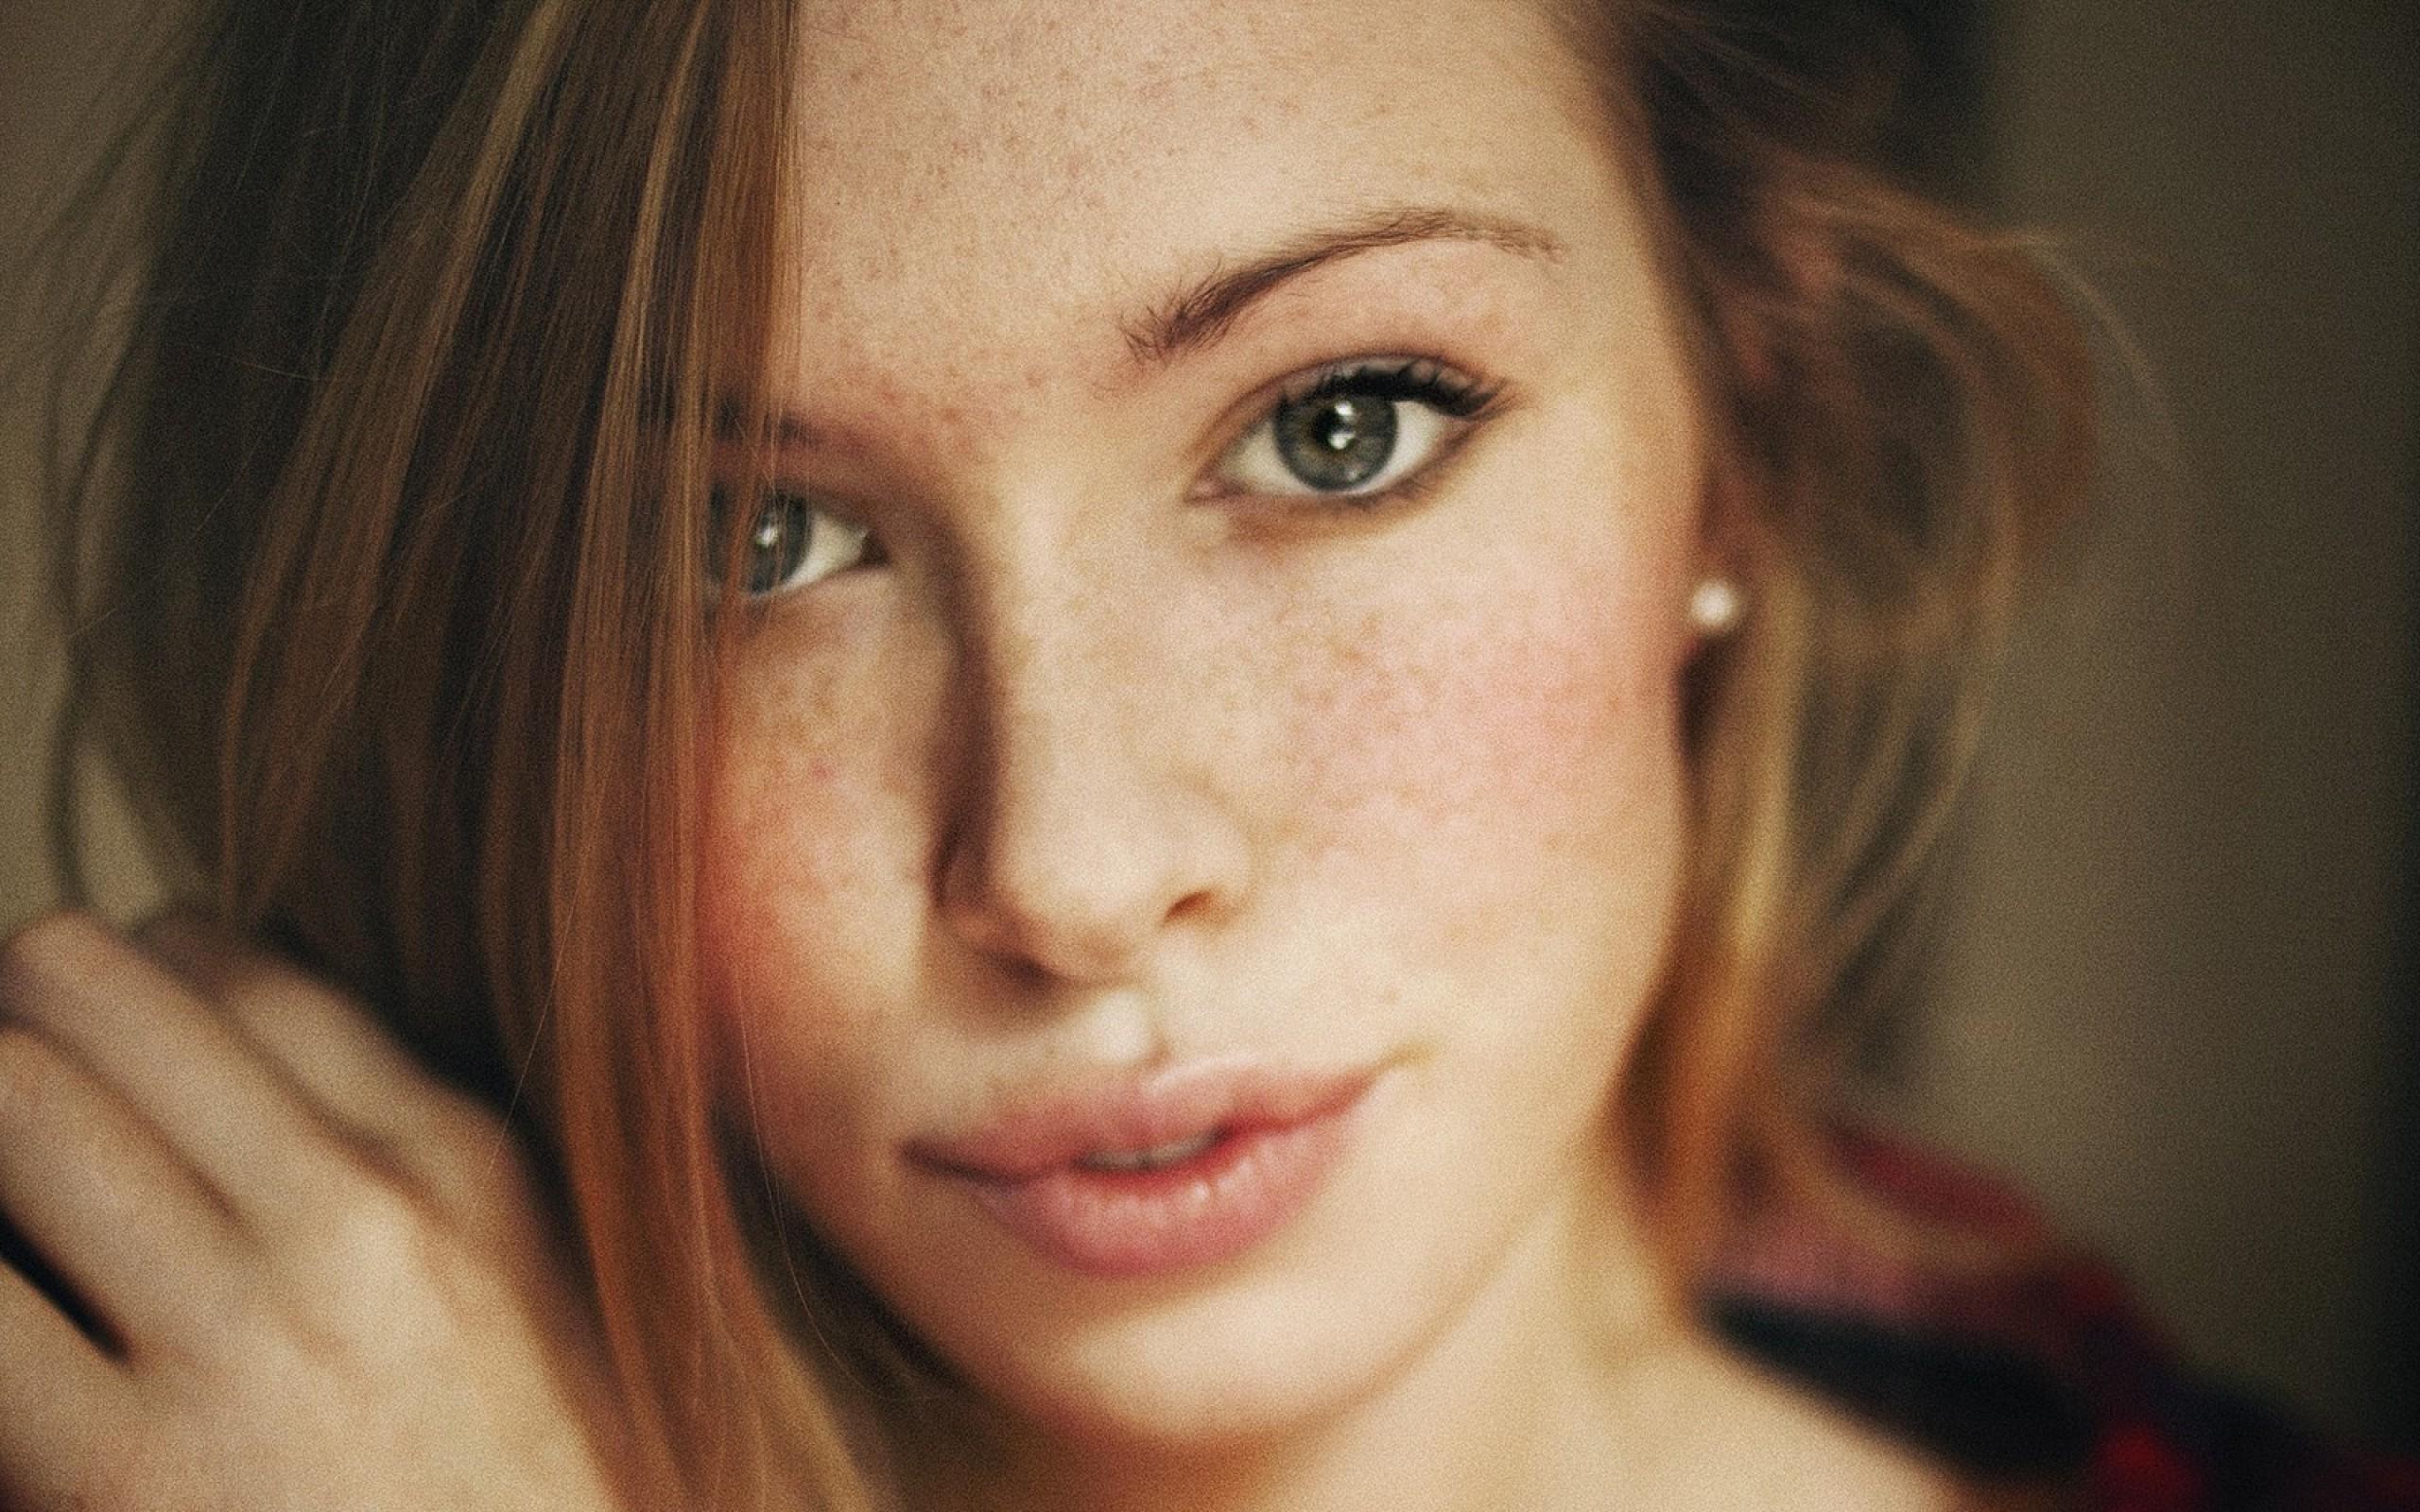 Wallpaper Face Women Model Long Hair Blue Eyes: Wallpaper : Face, Women, Redhead, Model, Long Hair, Blue